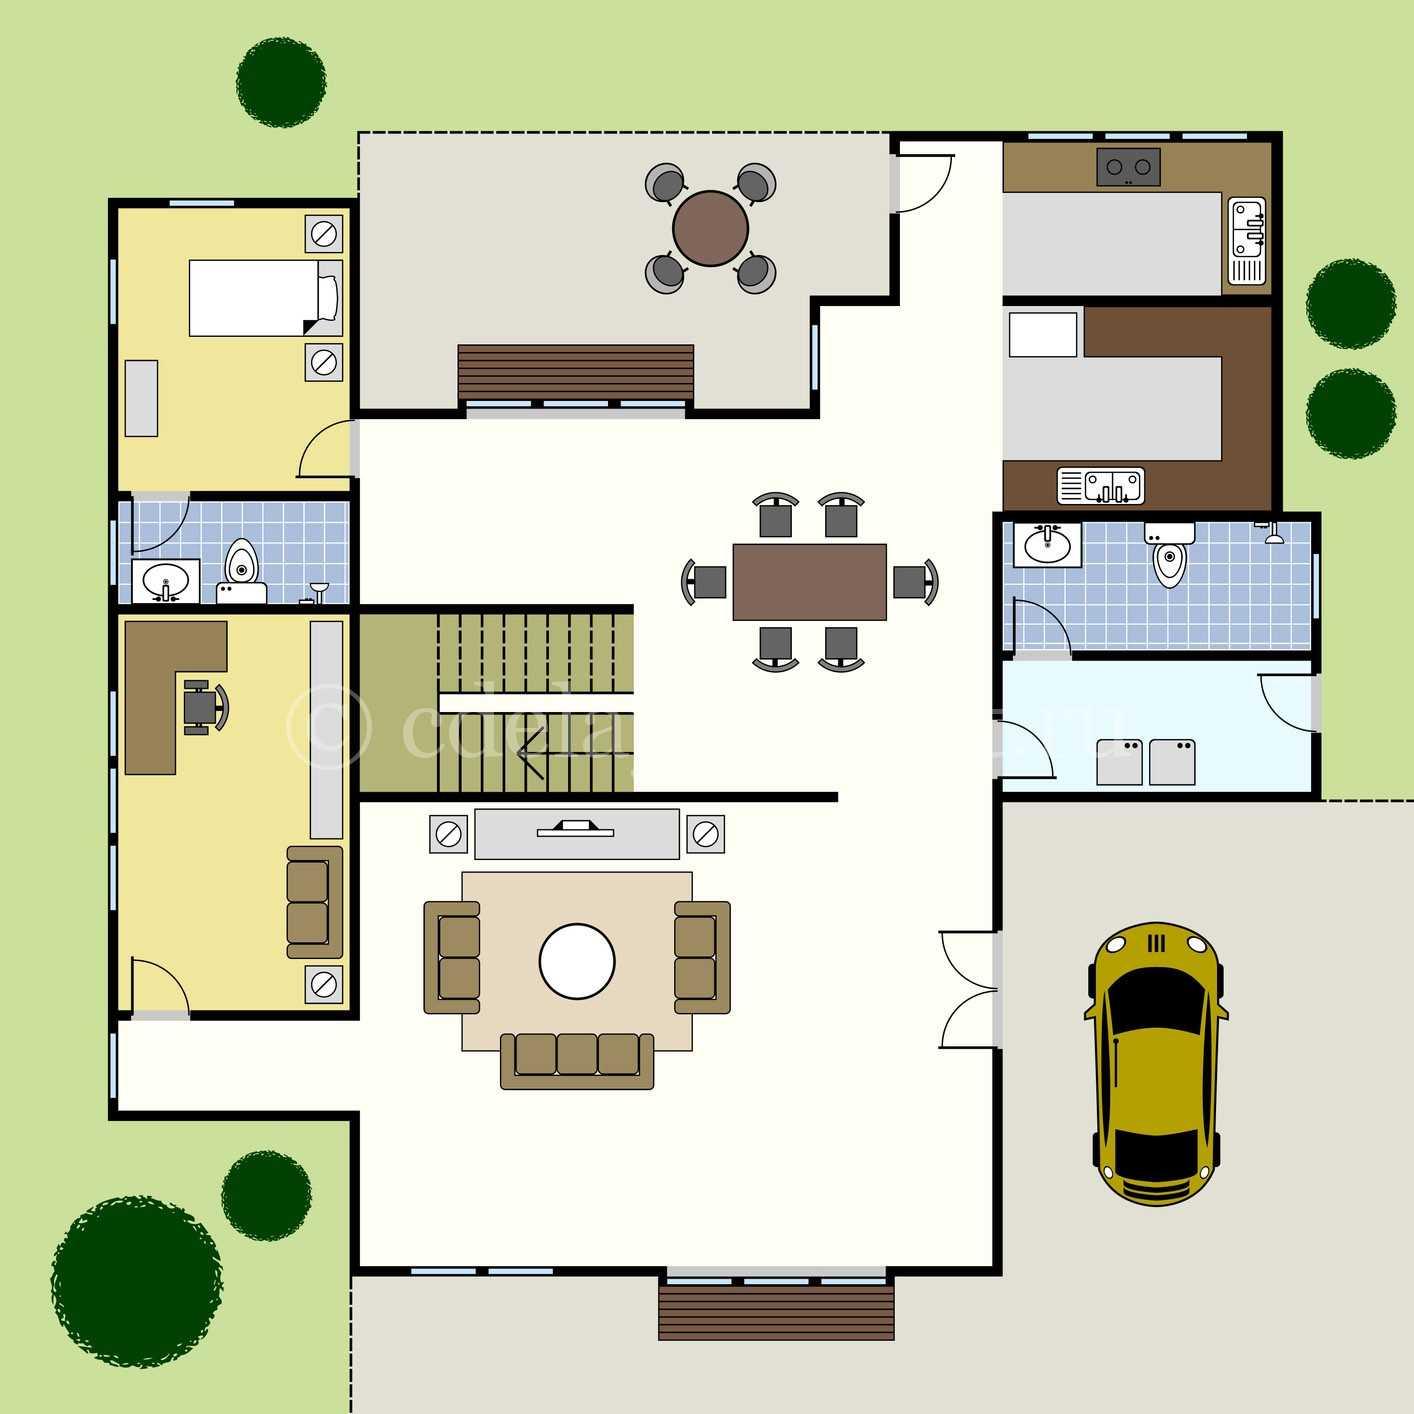 Планировка первого этажа дорогого дома